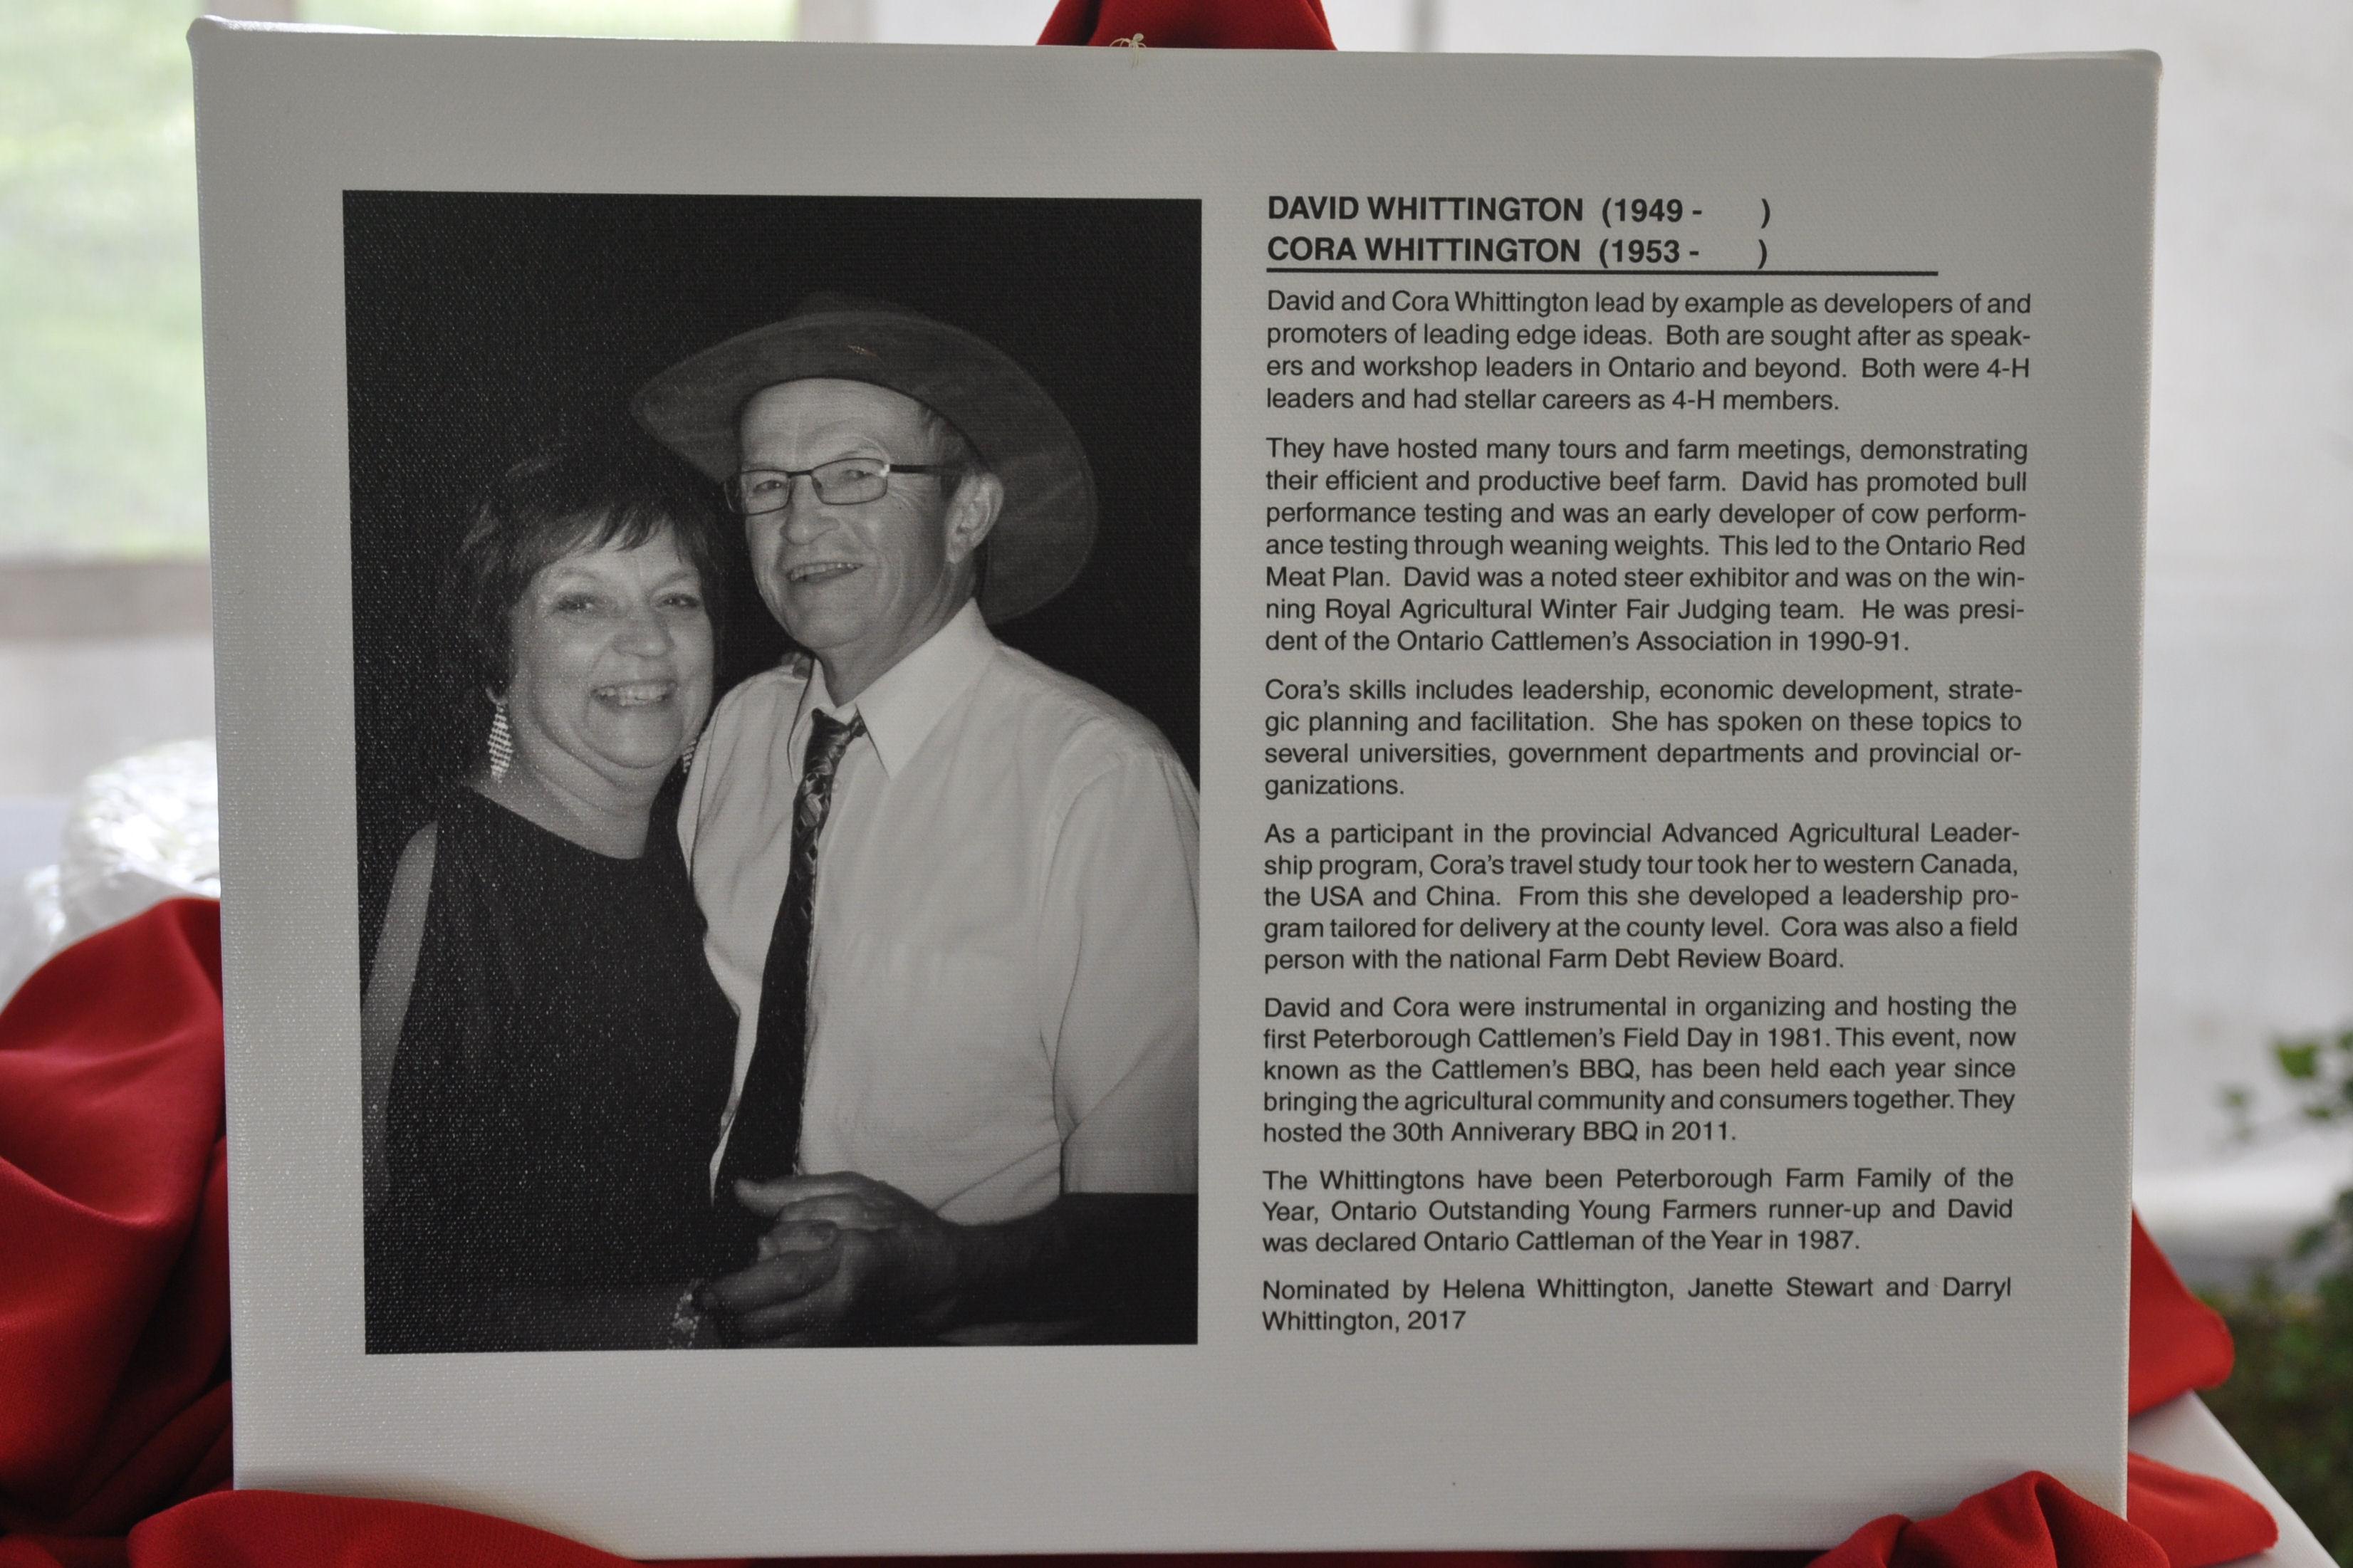 Cora and David Whittington